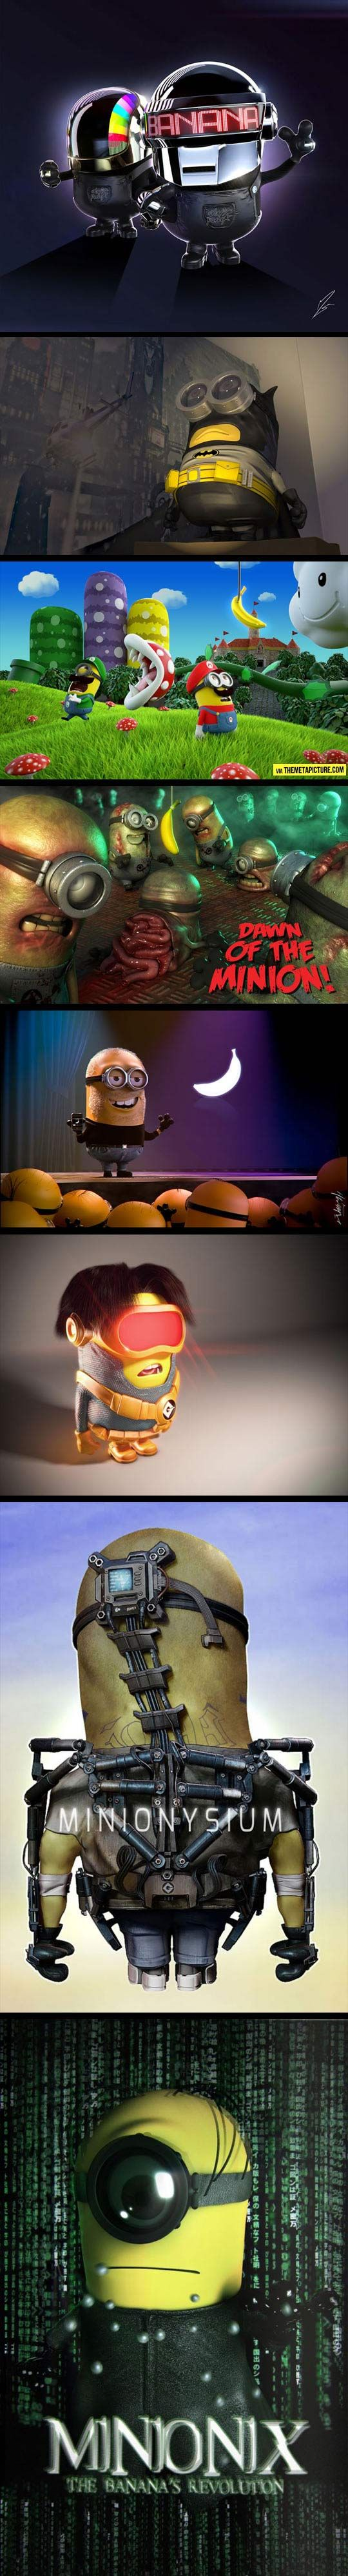 Minions… Minions Everywhere | OhGizmo!